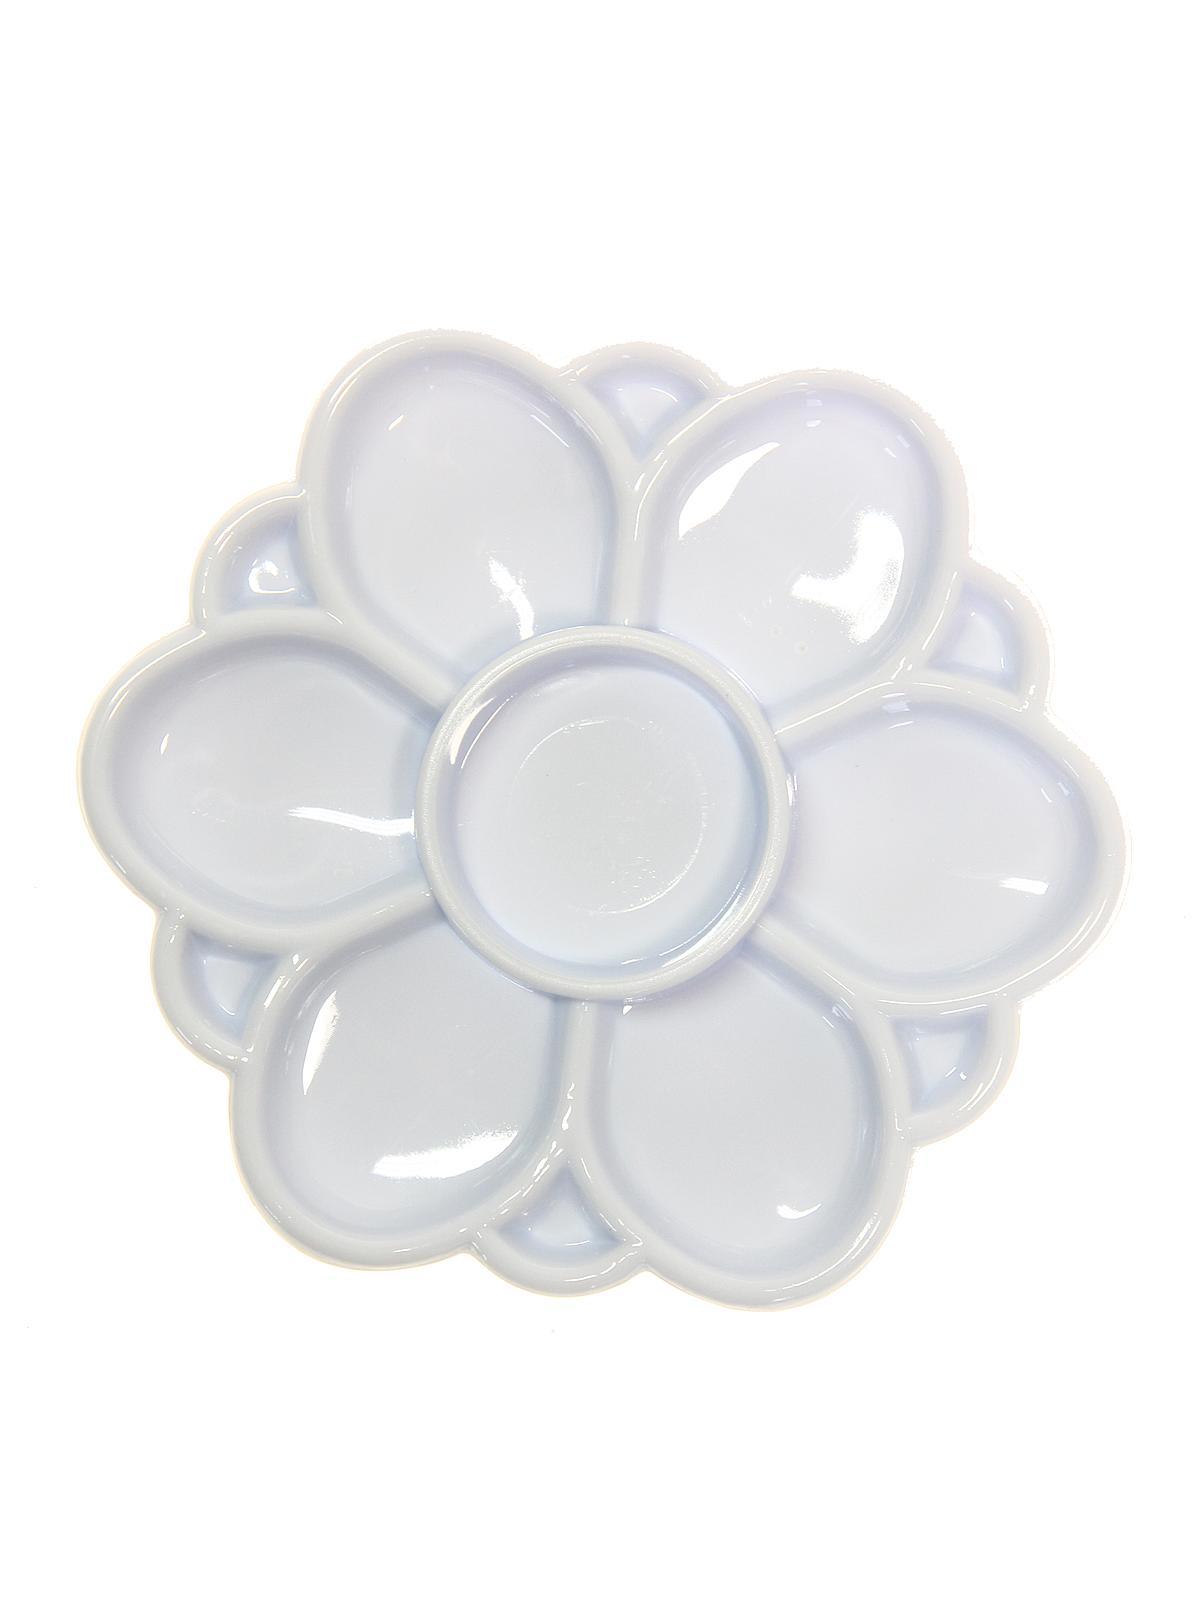 Seven Well Plastic Palette